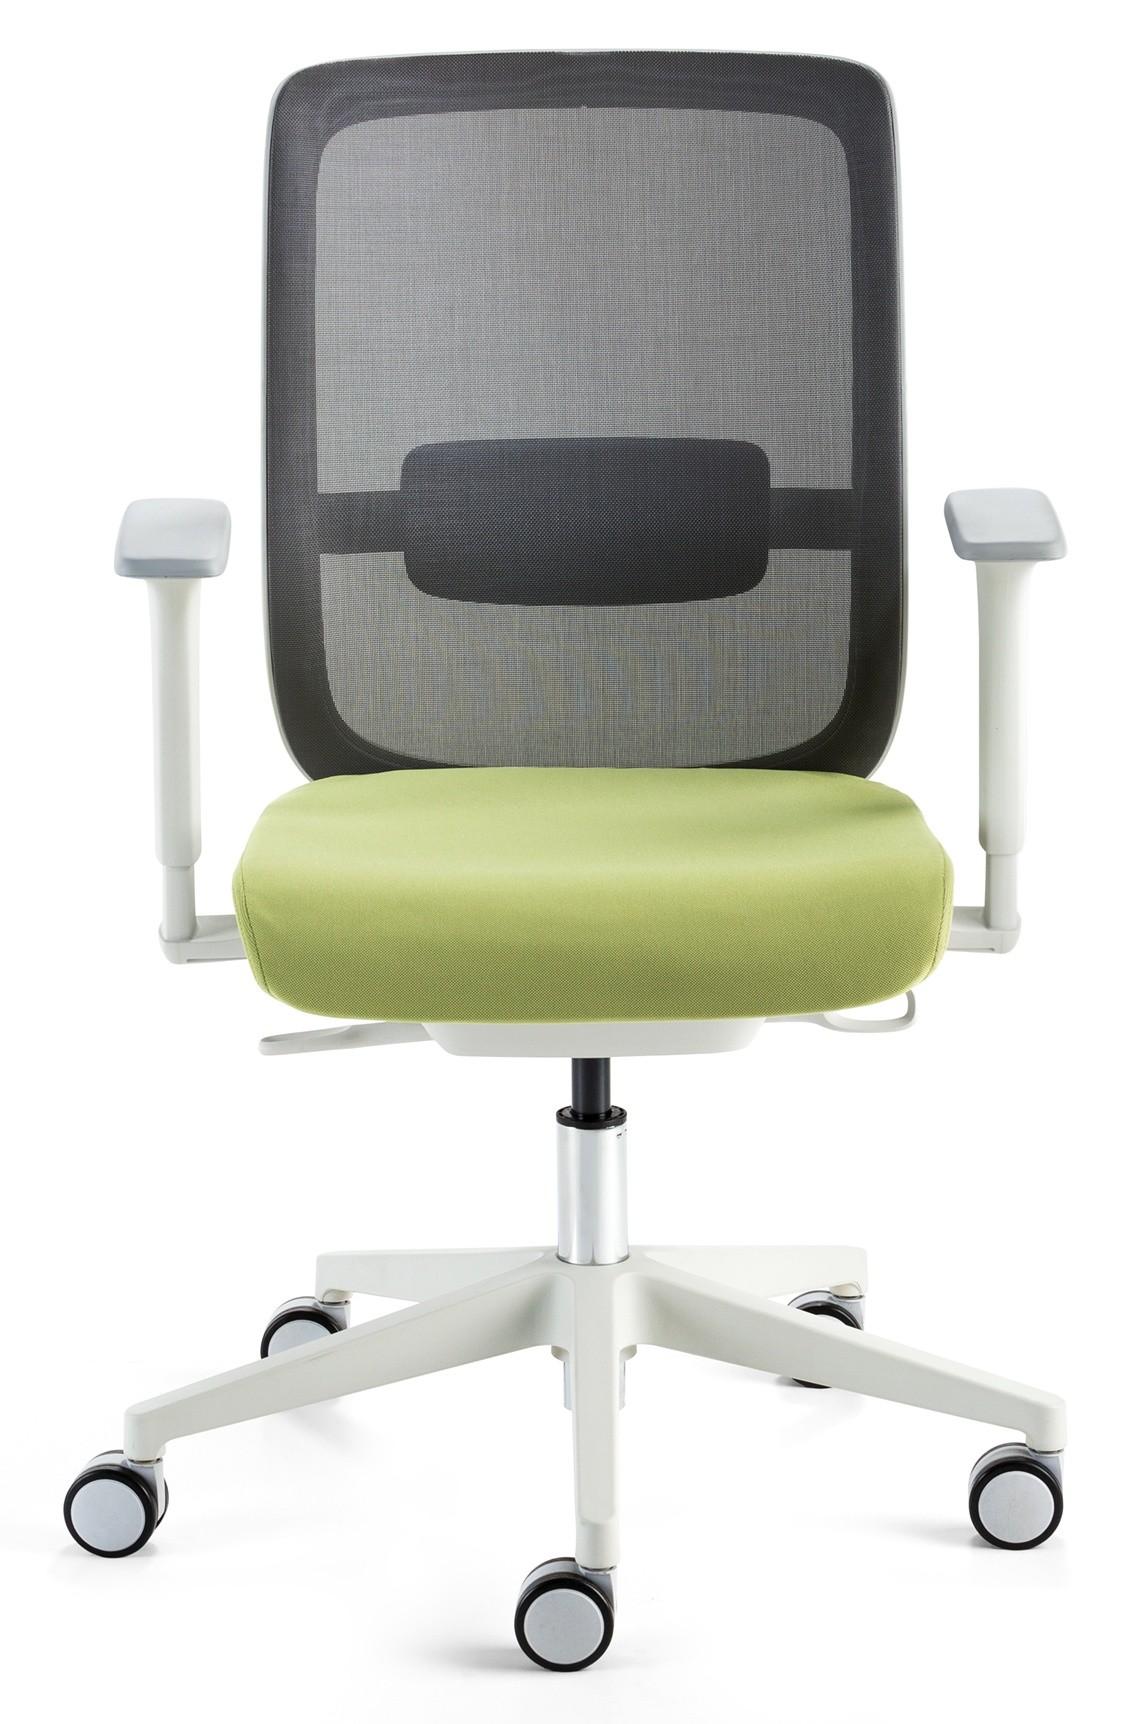 24Designs Bureaustoel Modena - Lichtgrijs - Groene Zitting